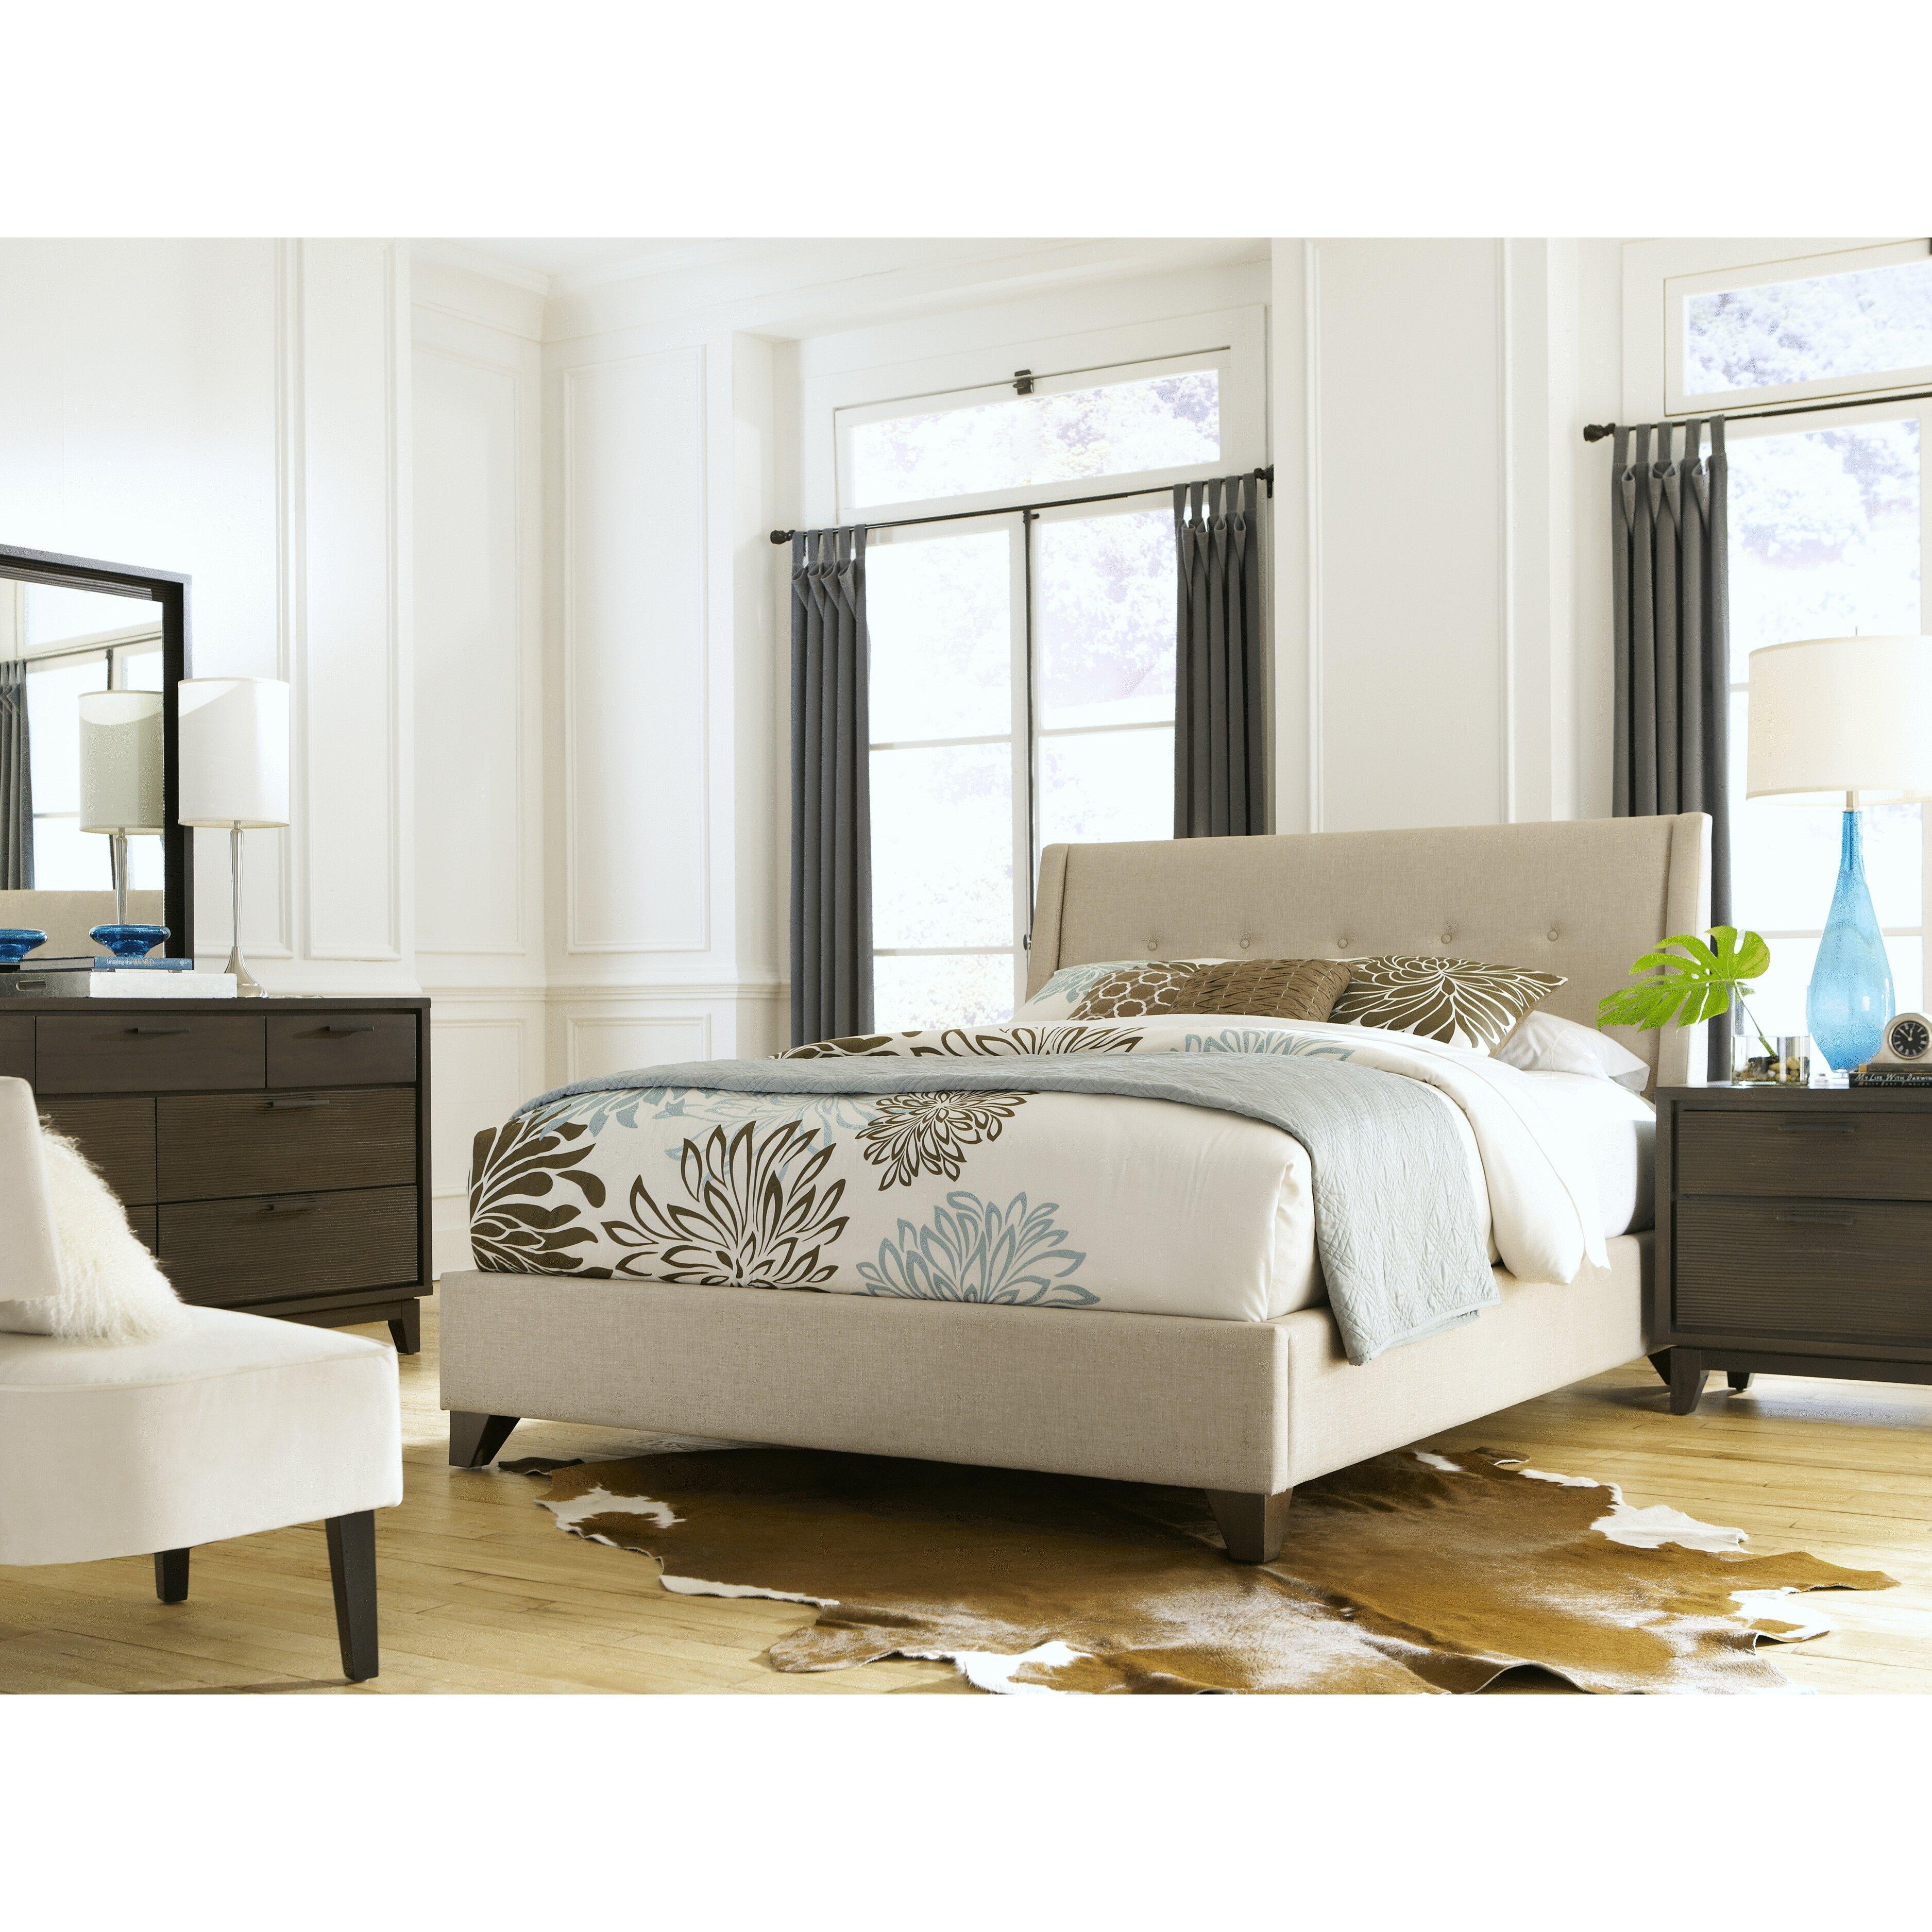 furniture bedroom furniture queen sized beds casana furniture